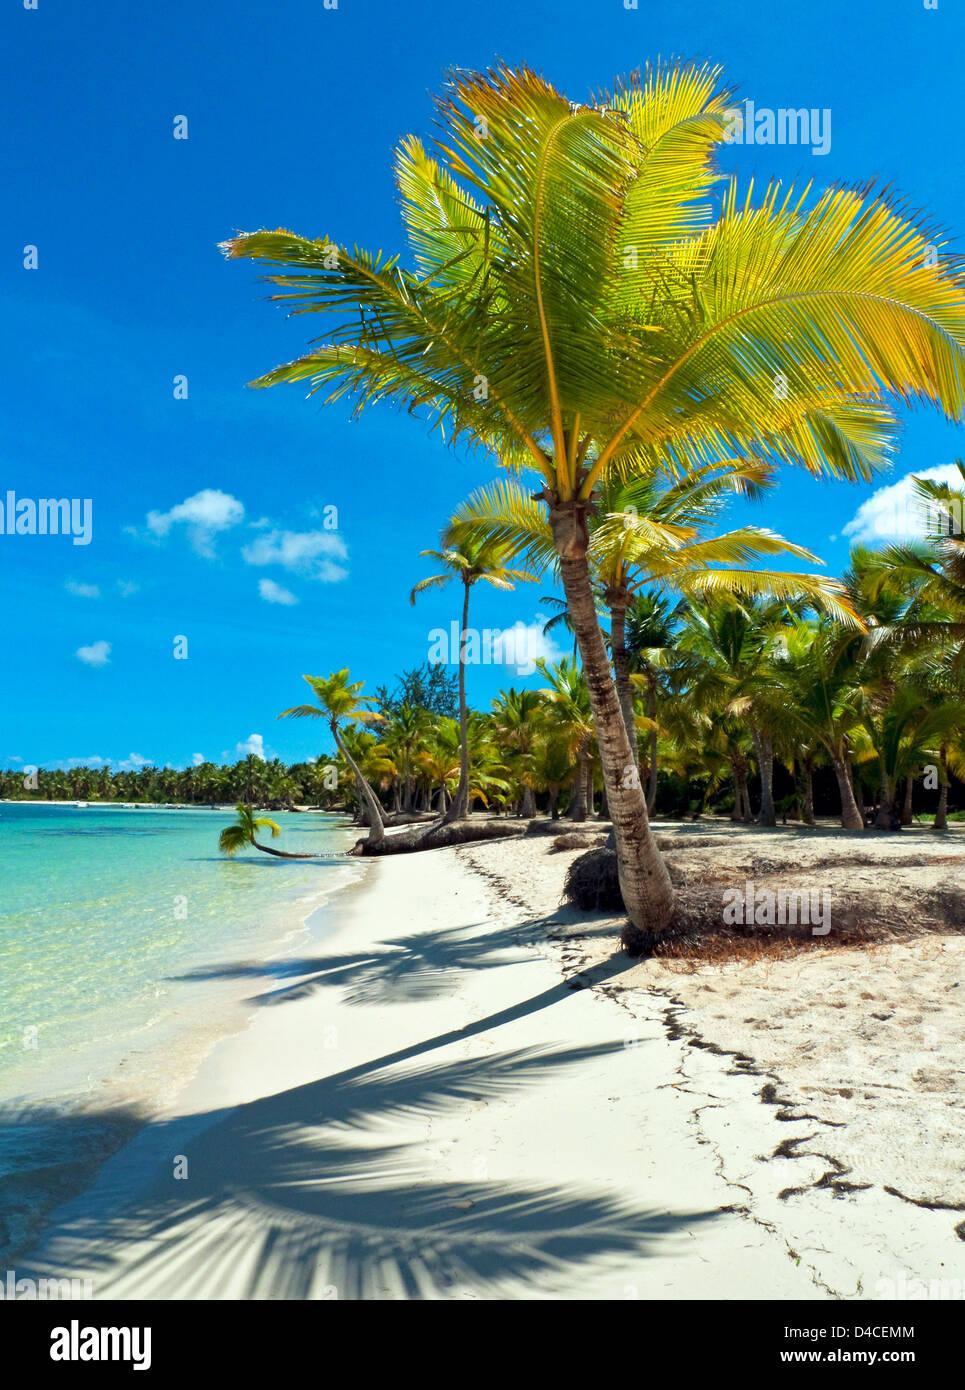 Palms at Playa Bavaro, Punta Cana, Repubblica Dominicana, Caraibi, America Immagini Stock